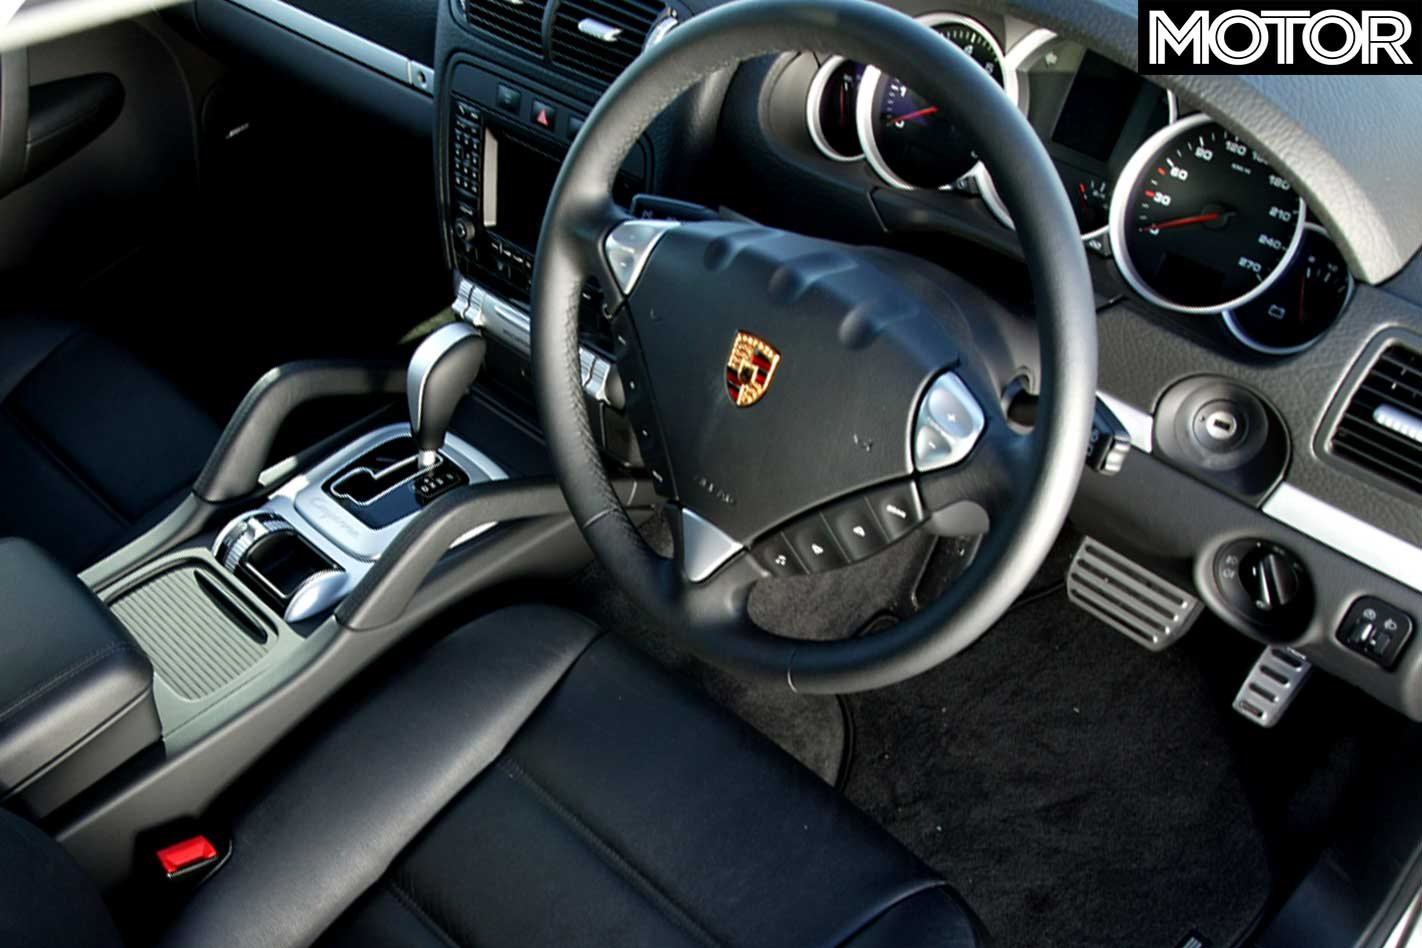 2004 Hsv Avalanche Vs Porsche Cayenne S Comparison Review Classic Motor